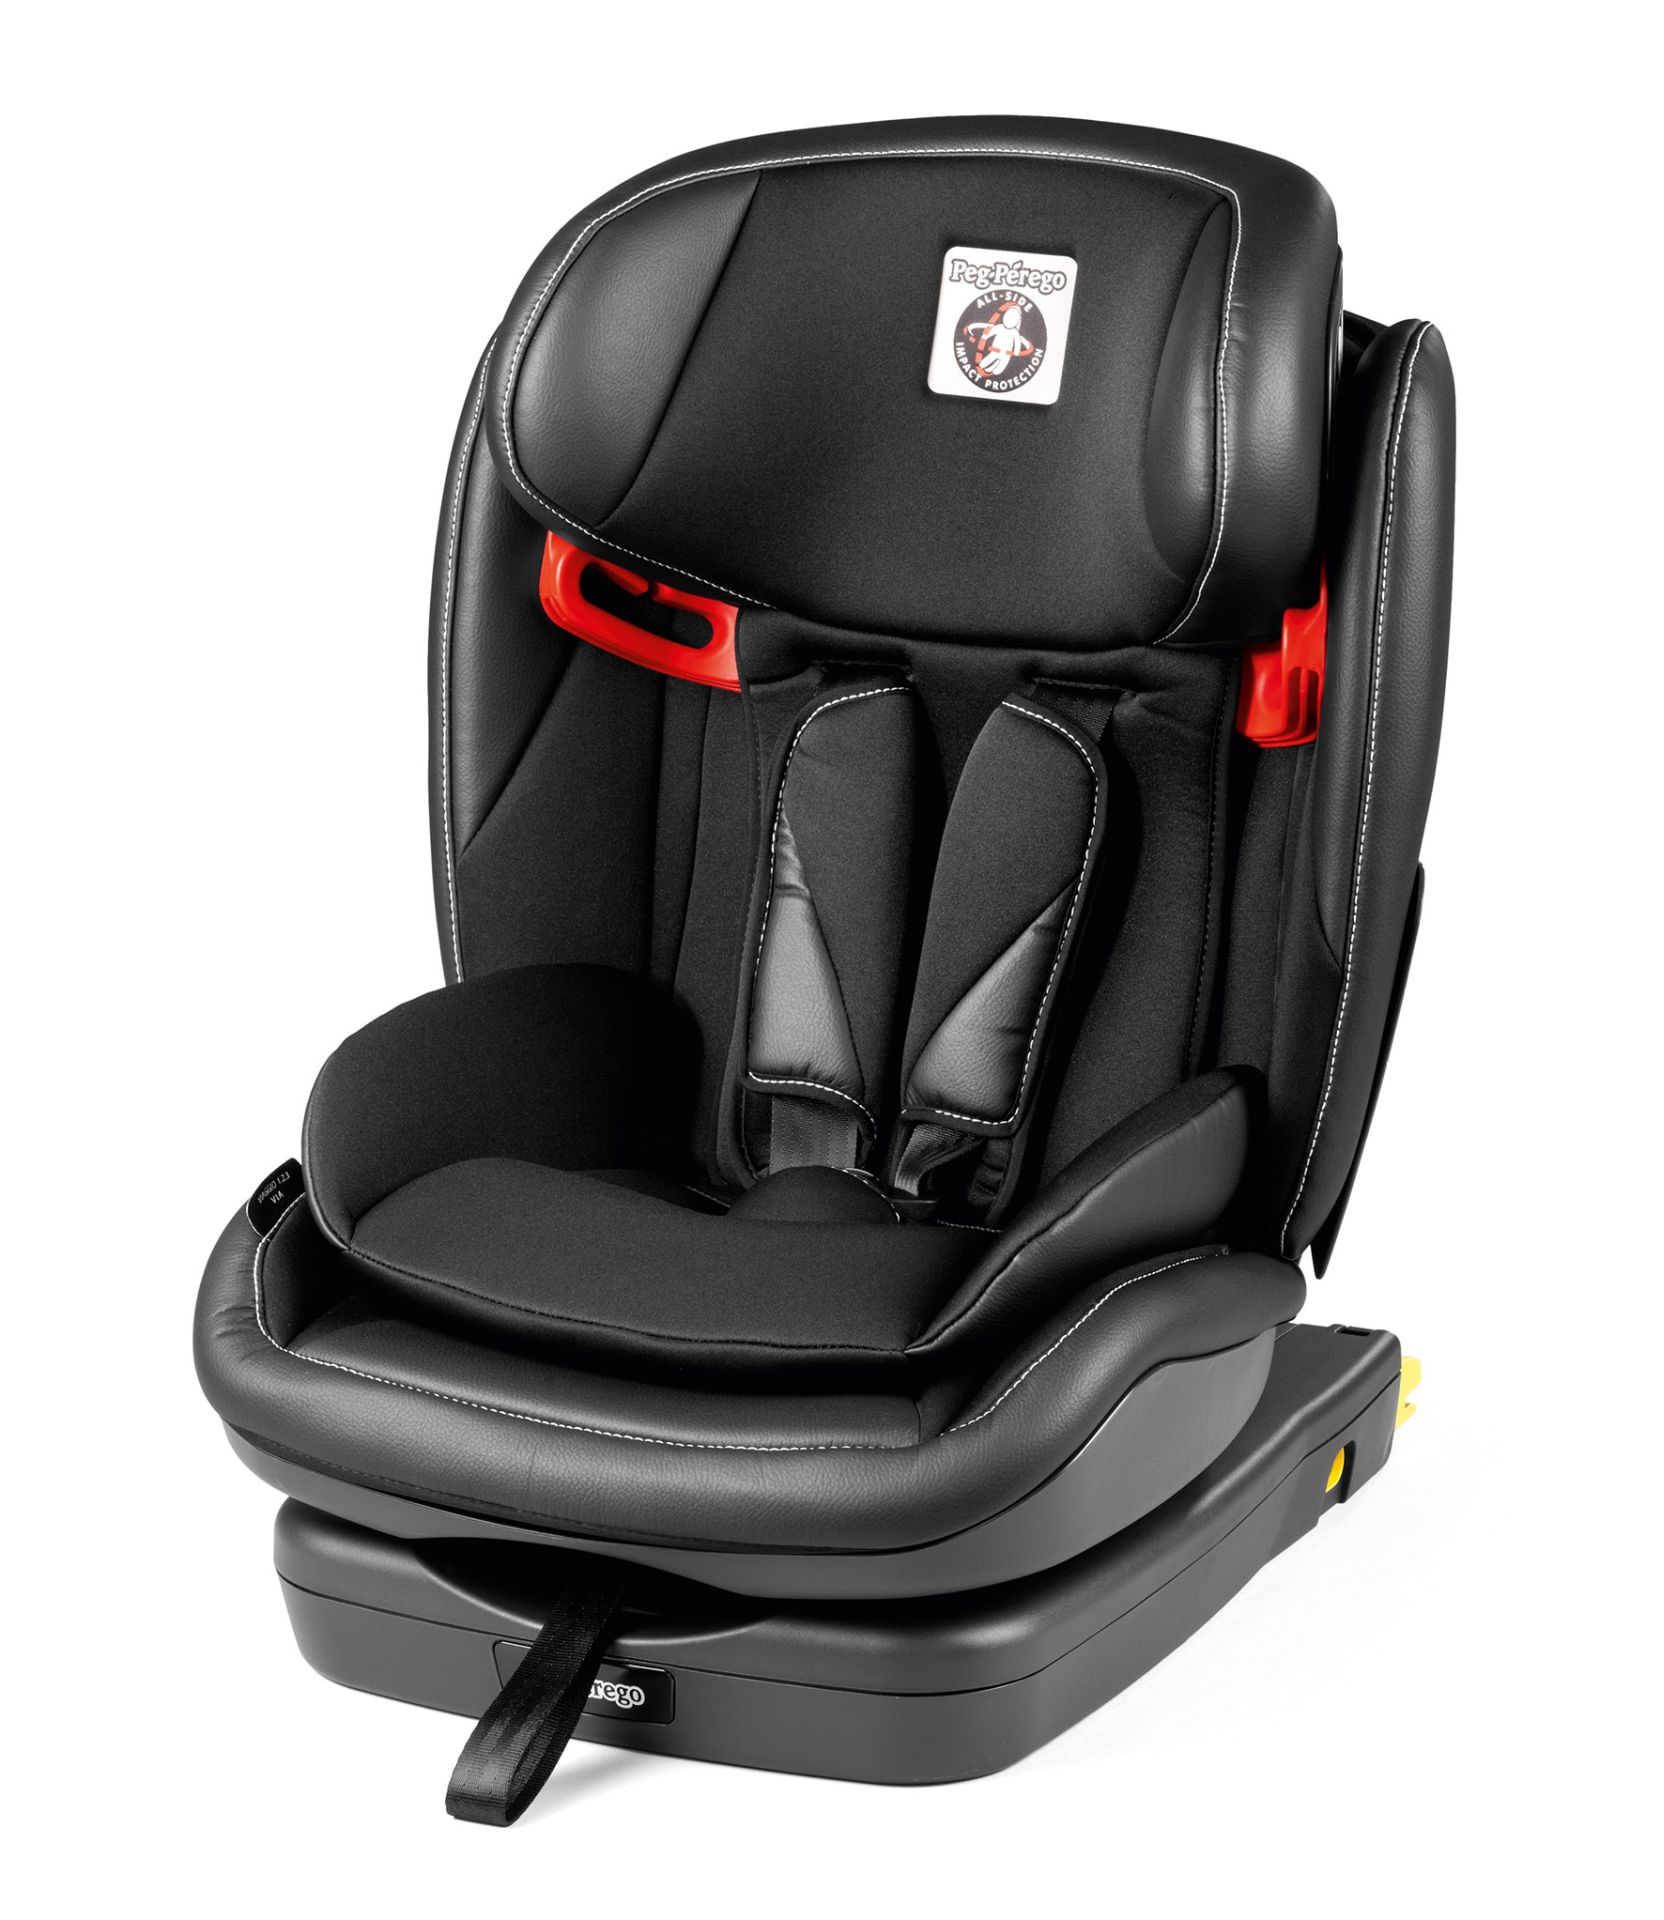 peg perego child car seat viaggio 1 2 3 via 2018 licorice. Black Bedroom Furniture Sets. Home Design Ideas